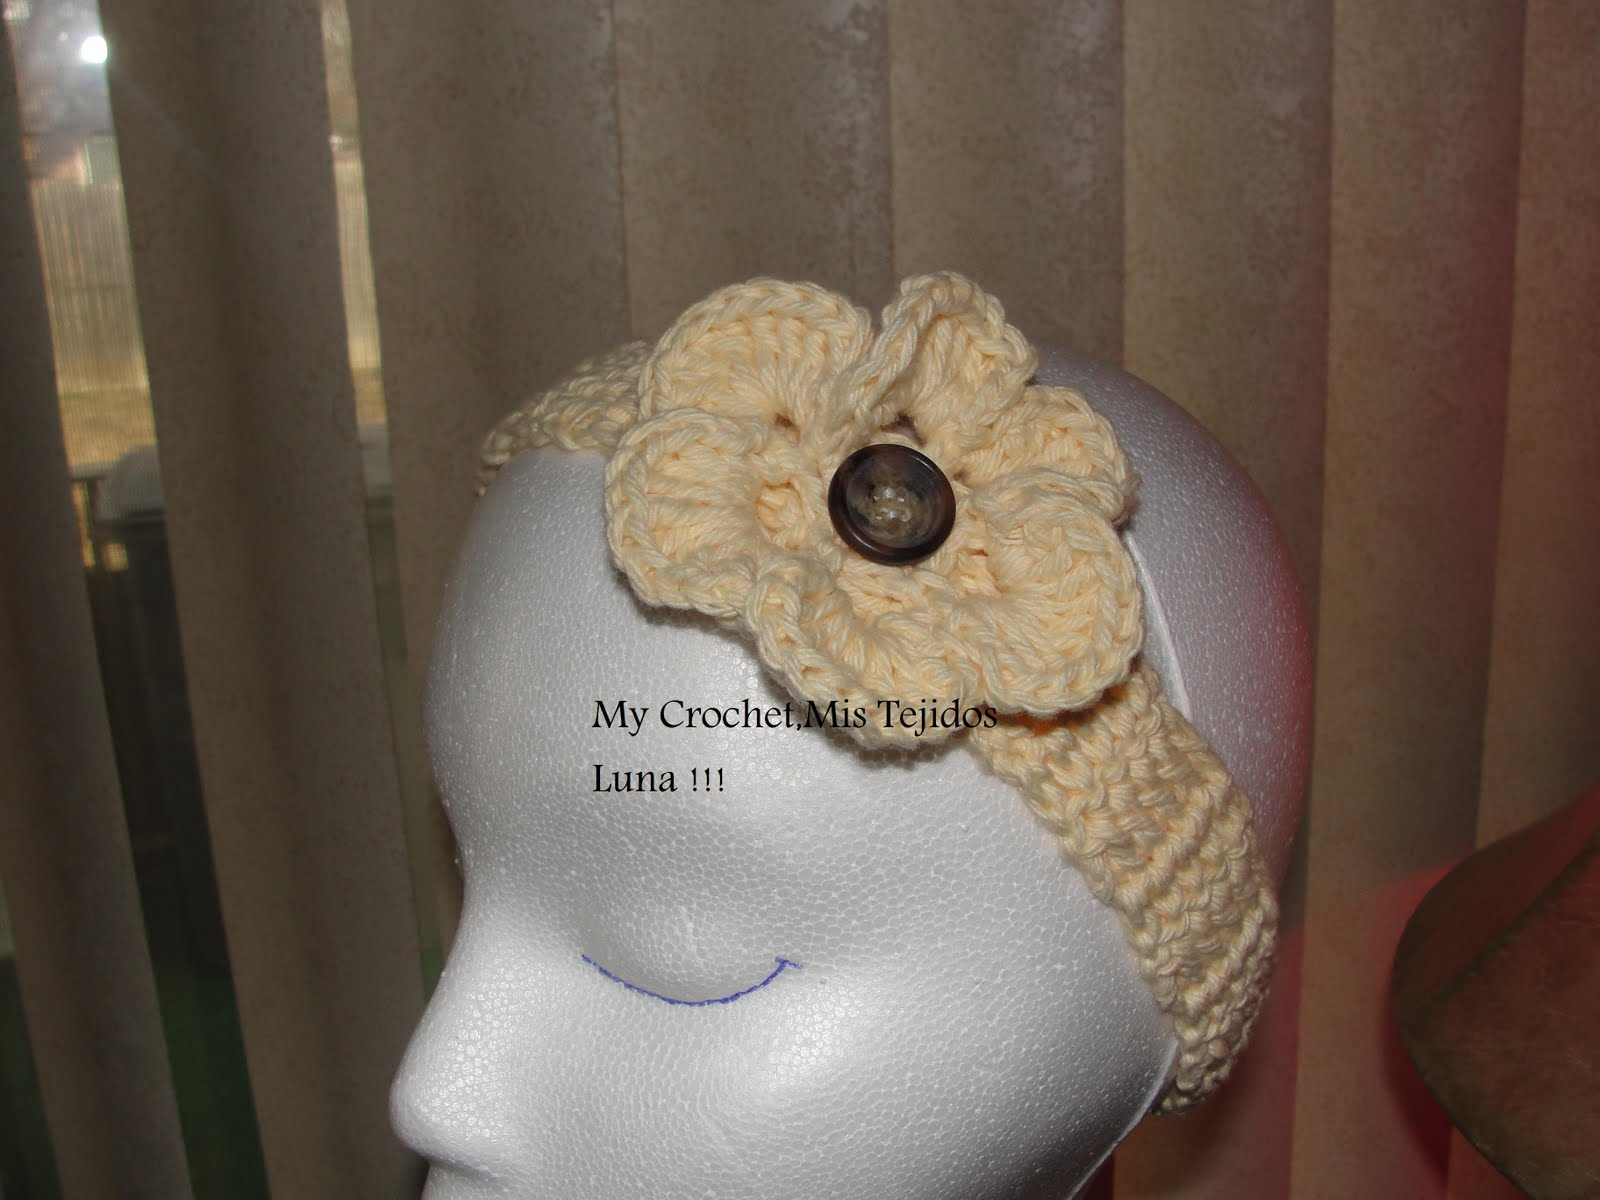 My crochet mis tejidos by luna diademas o vinchas mis - Diademas a crochet ...